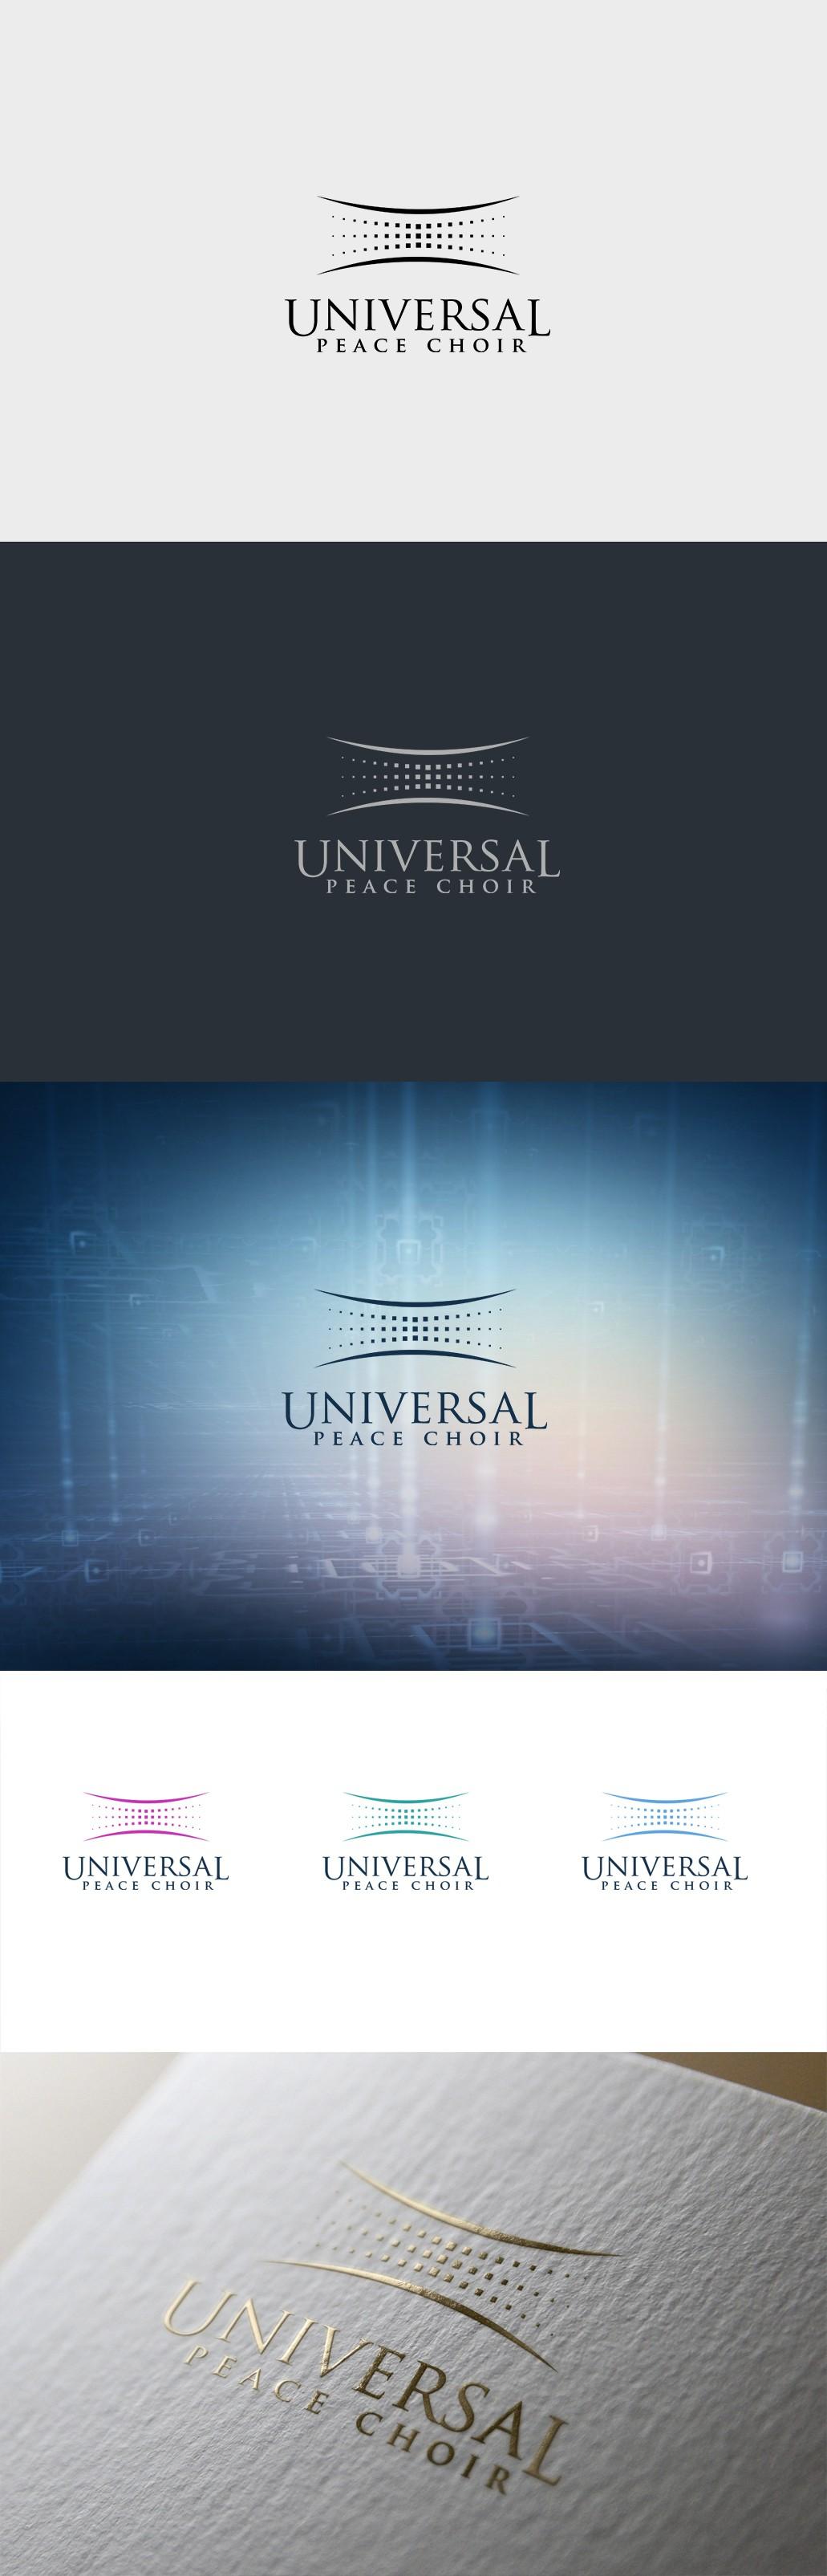 Universal Peace Choir